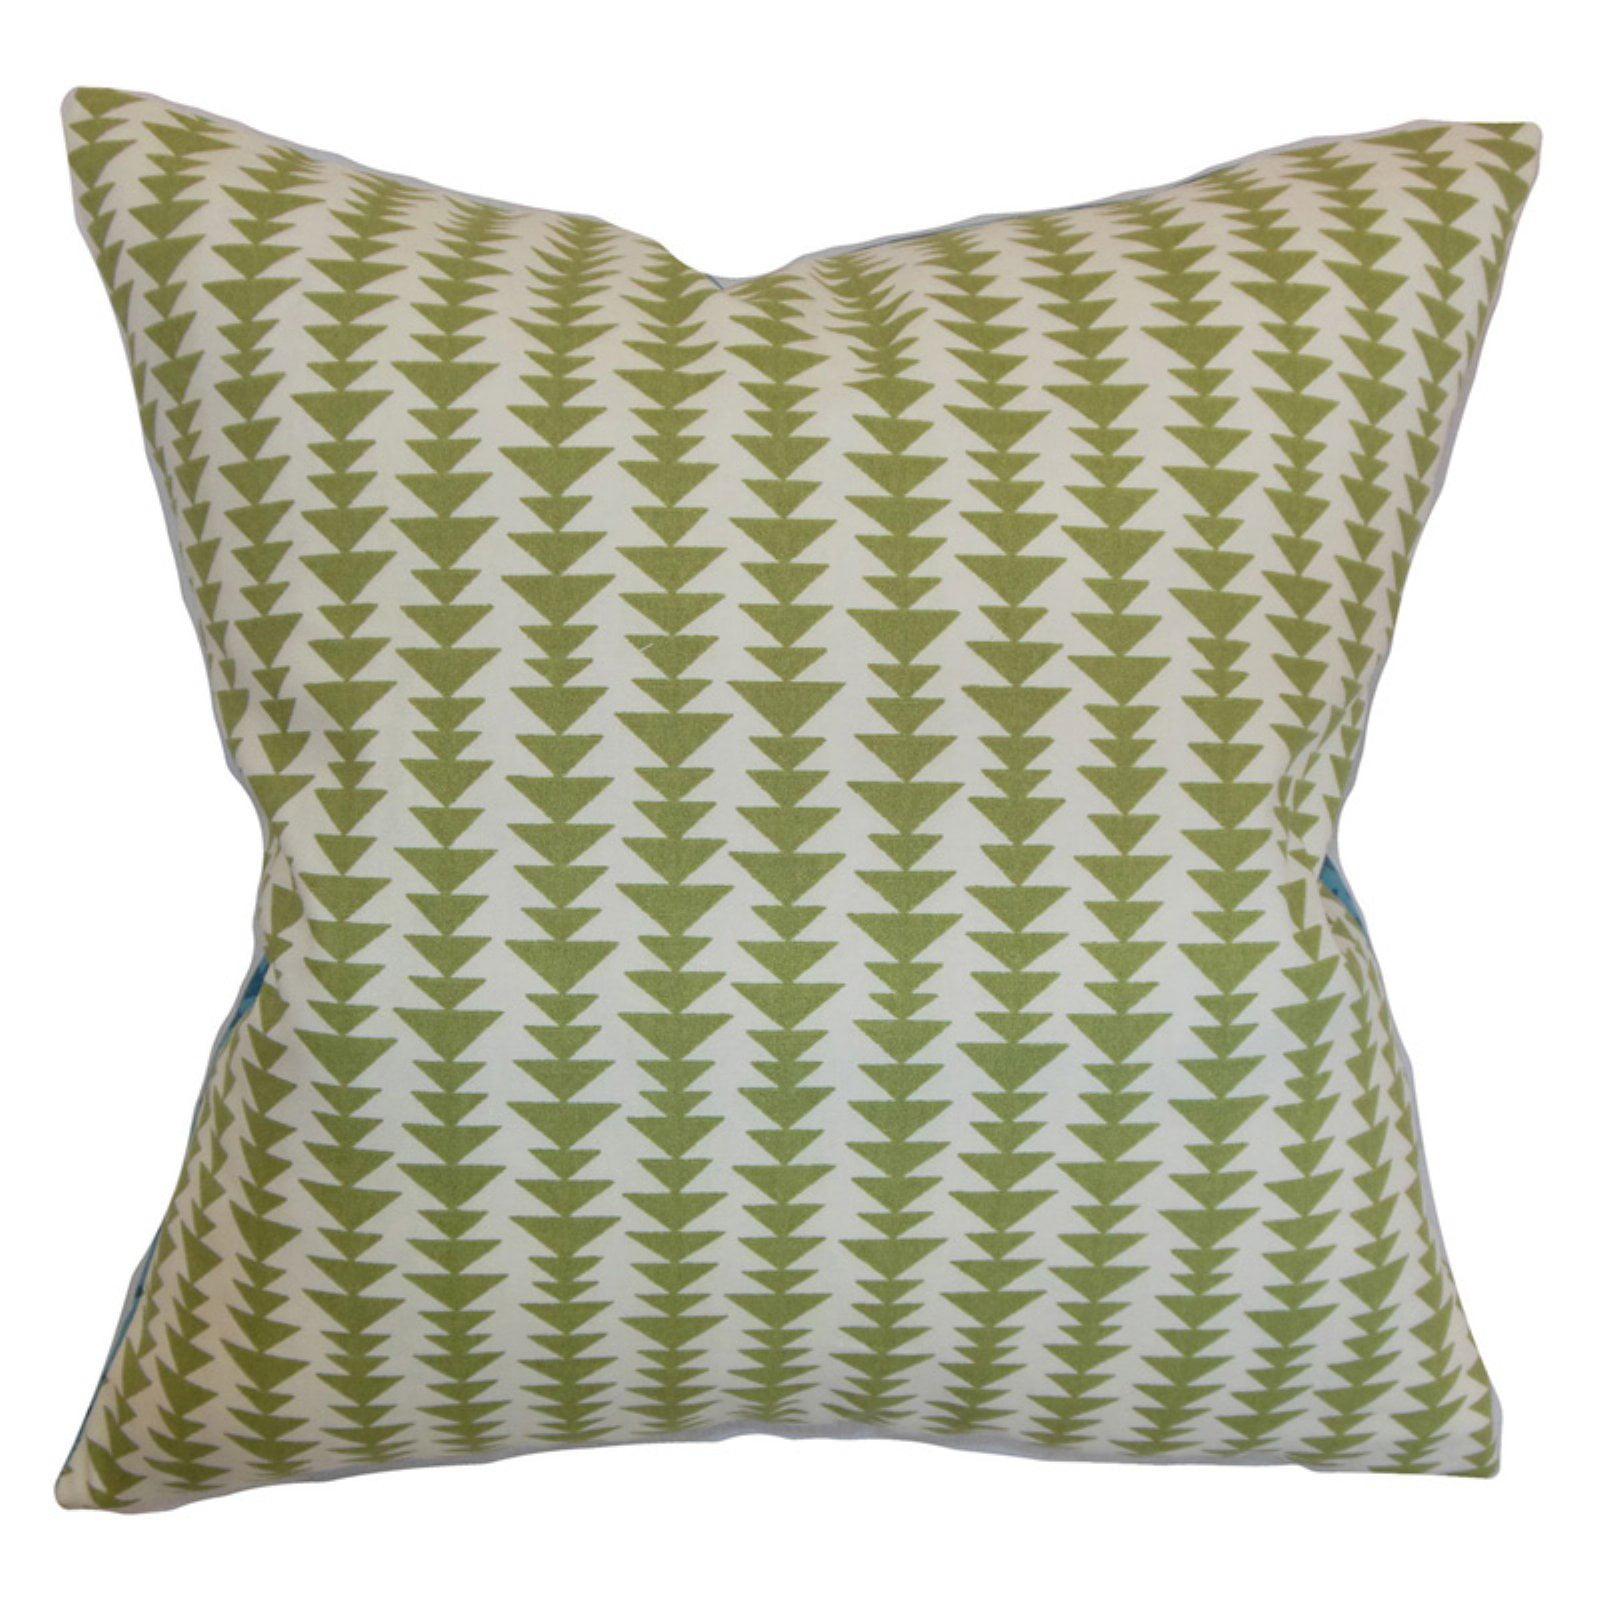 The Pillow Collection Jiri Geometric Pillow